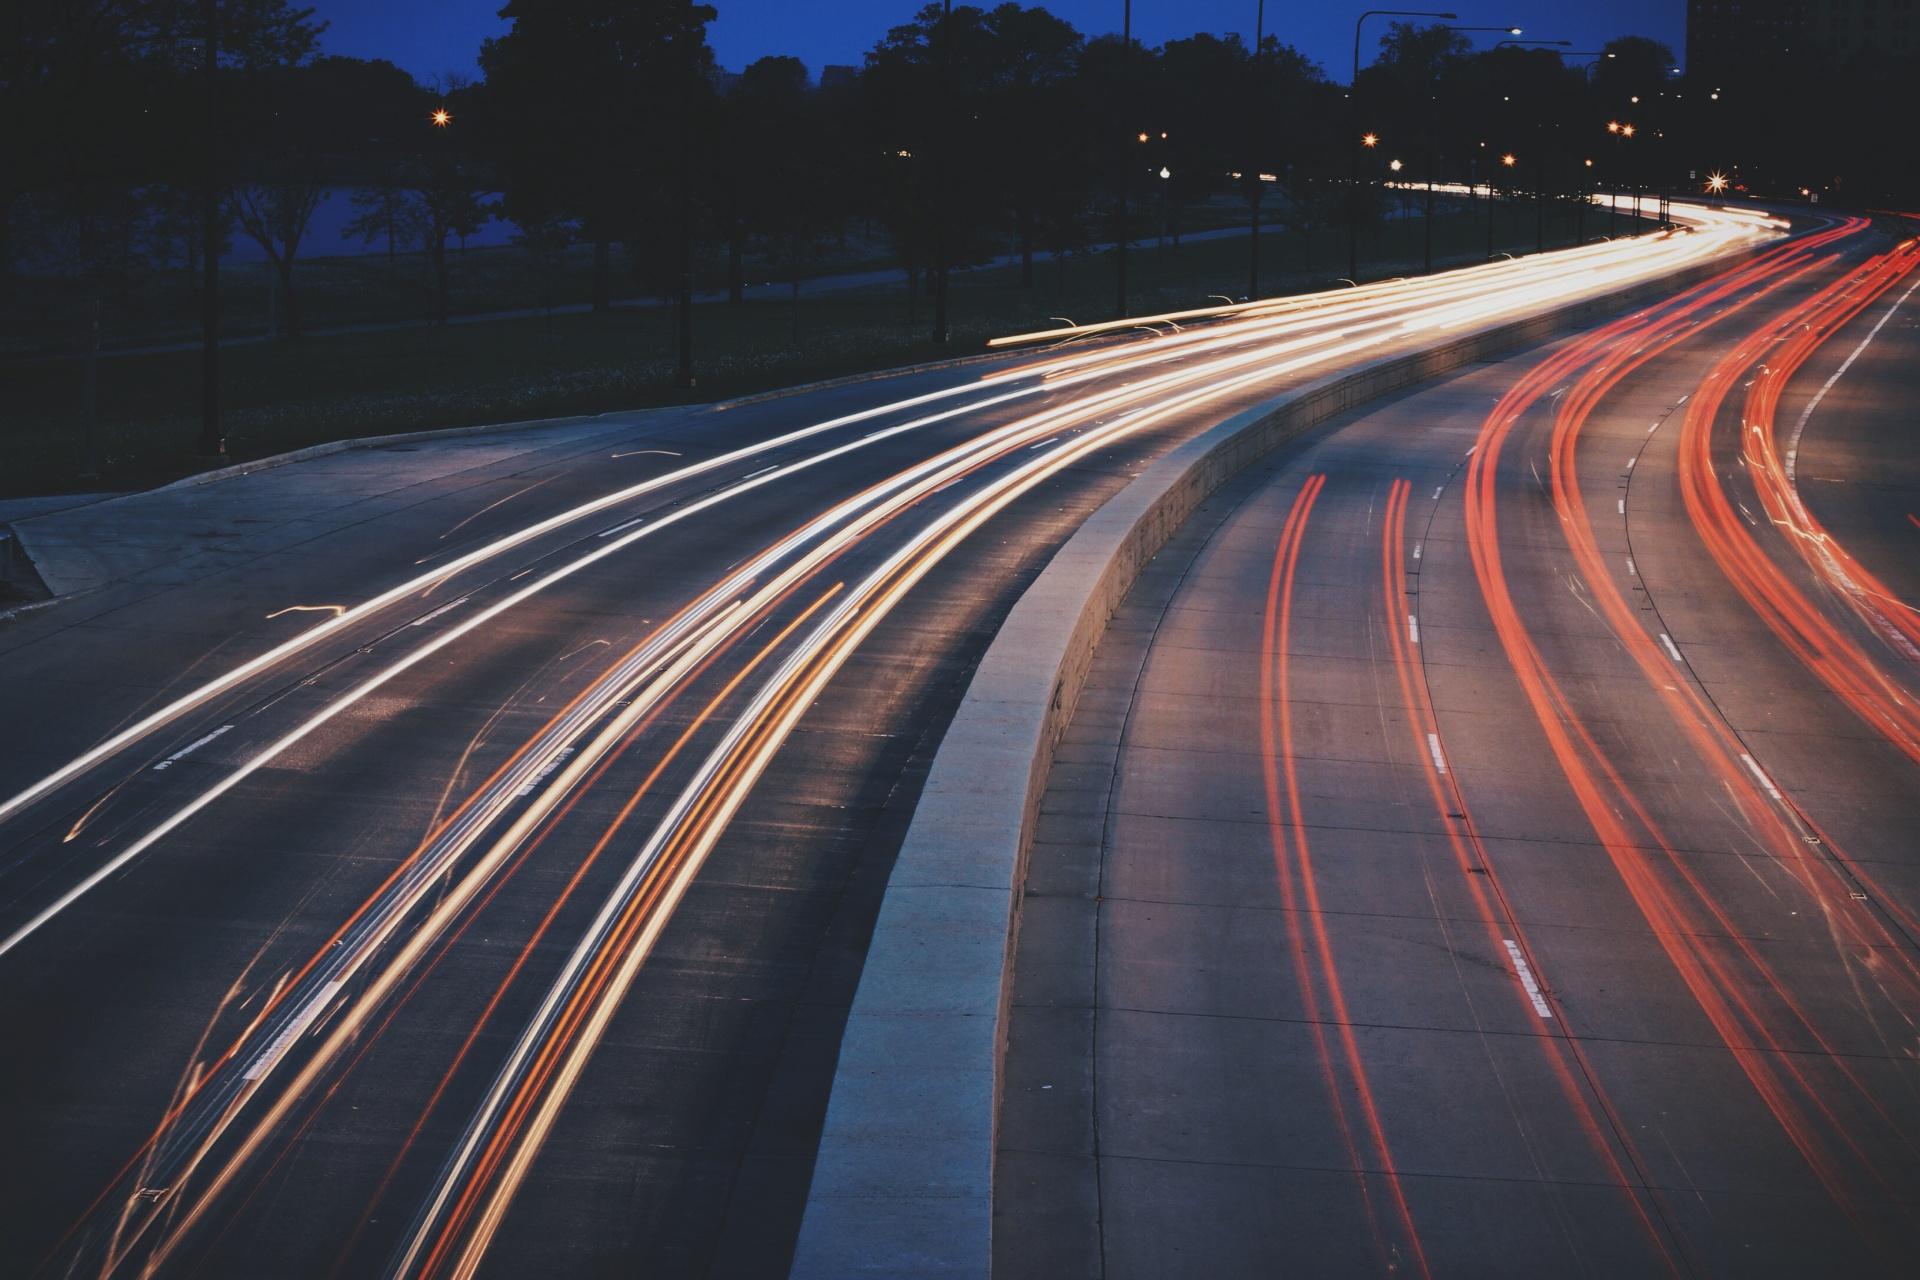 night-traffic-14939955154Gn.jpg